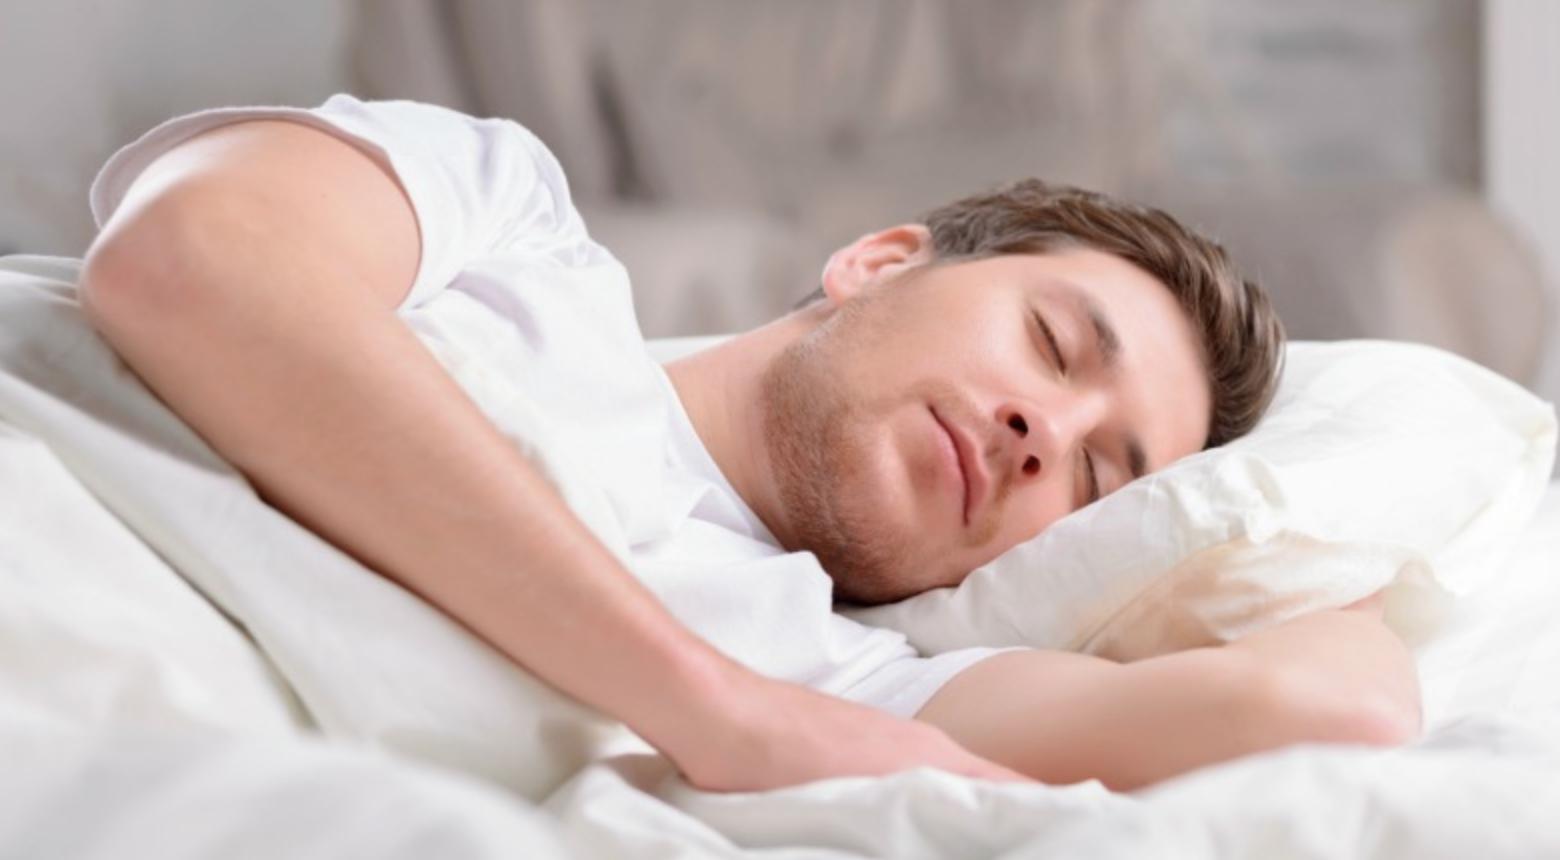 Ilustrasi Tidur Berkualitas